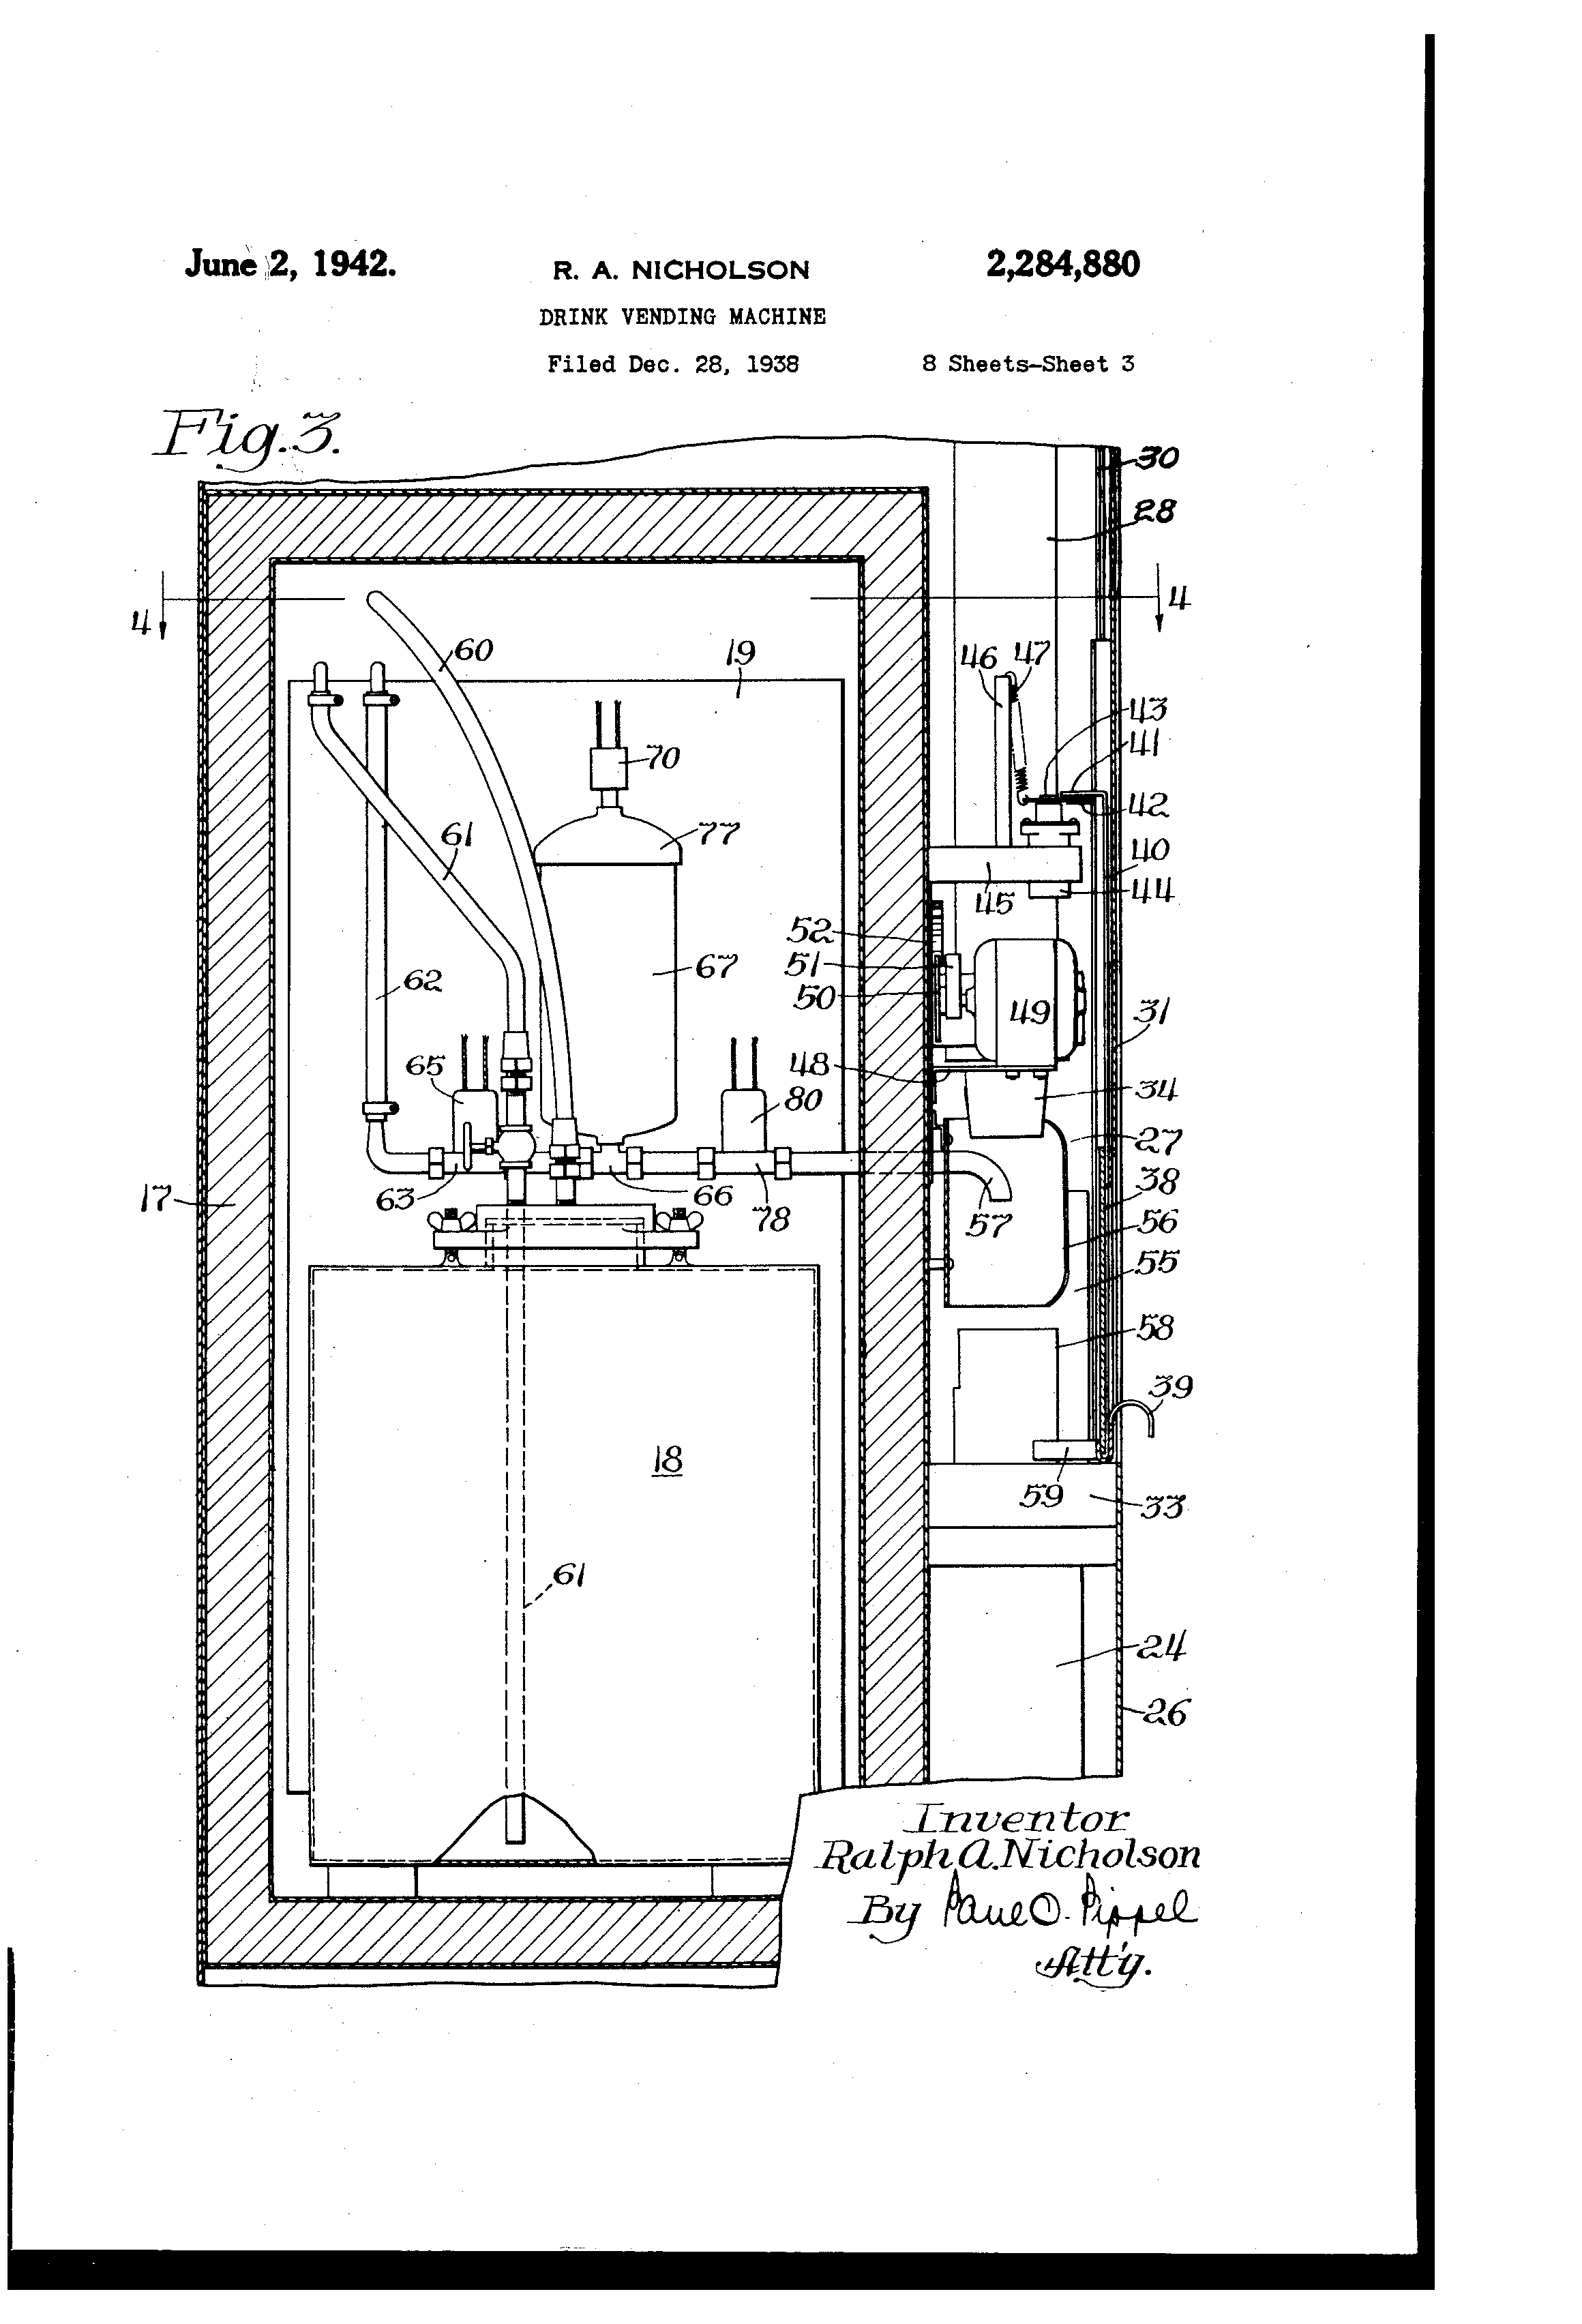 vendo 83 coke machine wiring diagram   36 wiring diagram